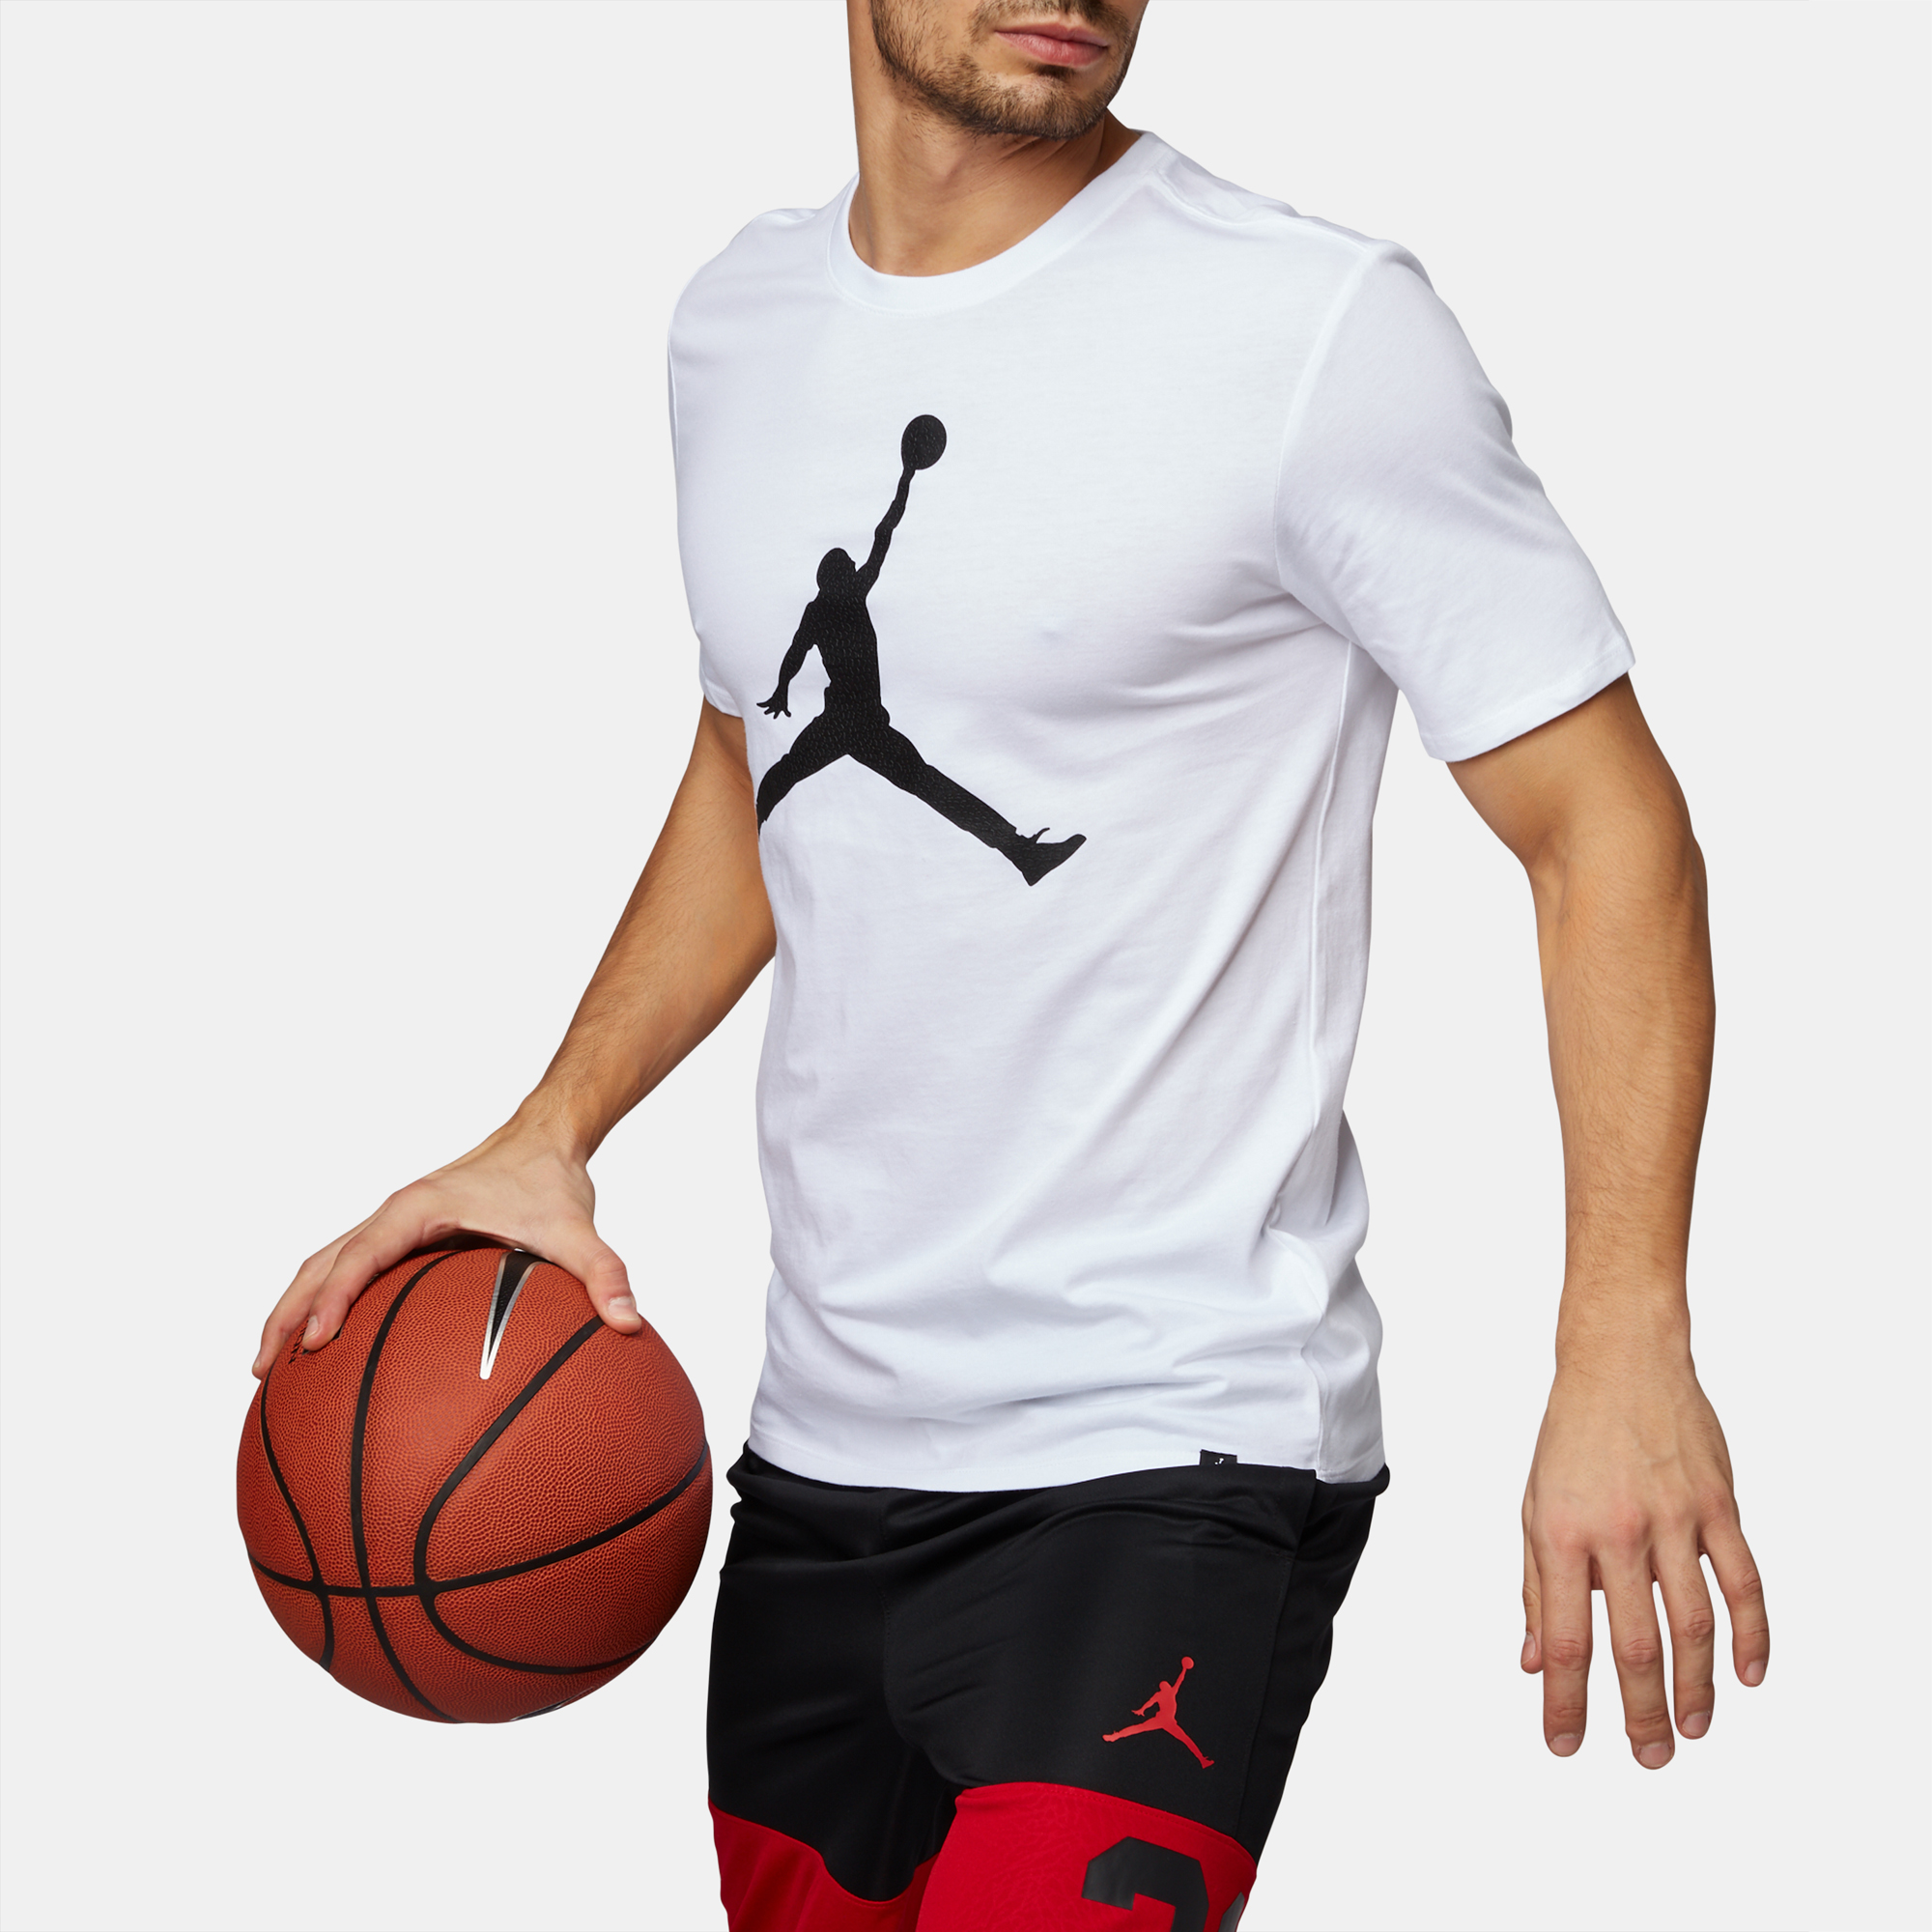 8d10074ef521 Air Jordan T Shirts Philippines - DREAMWORKS